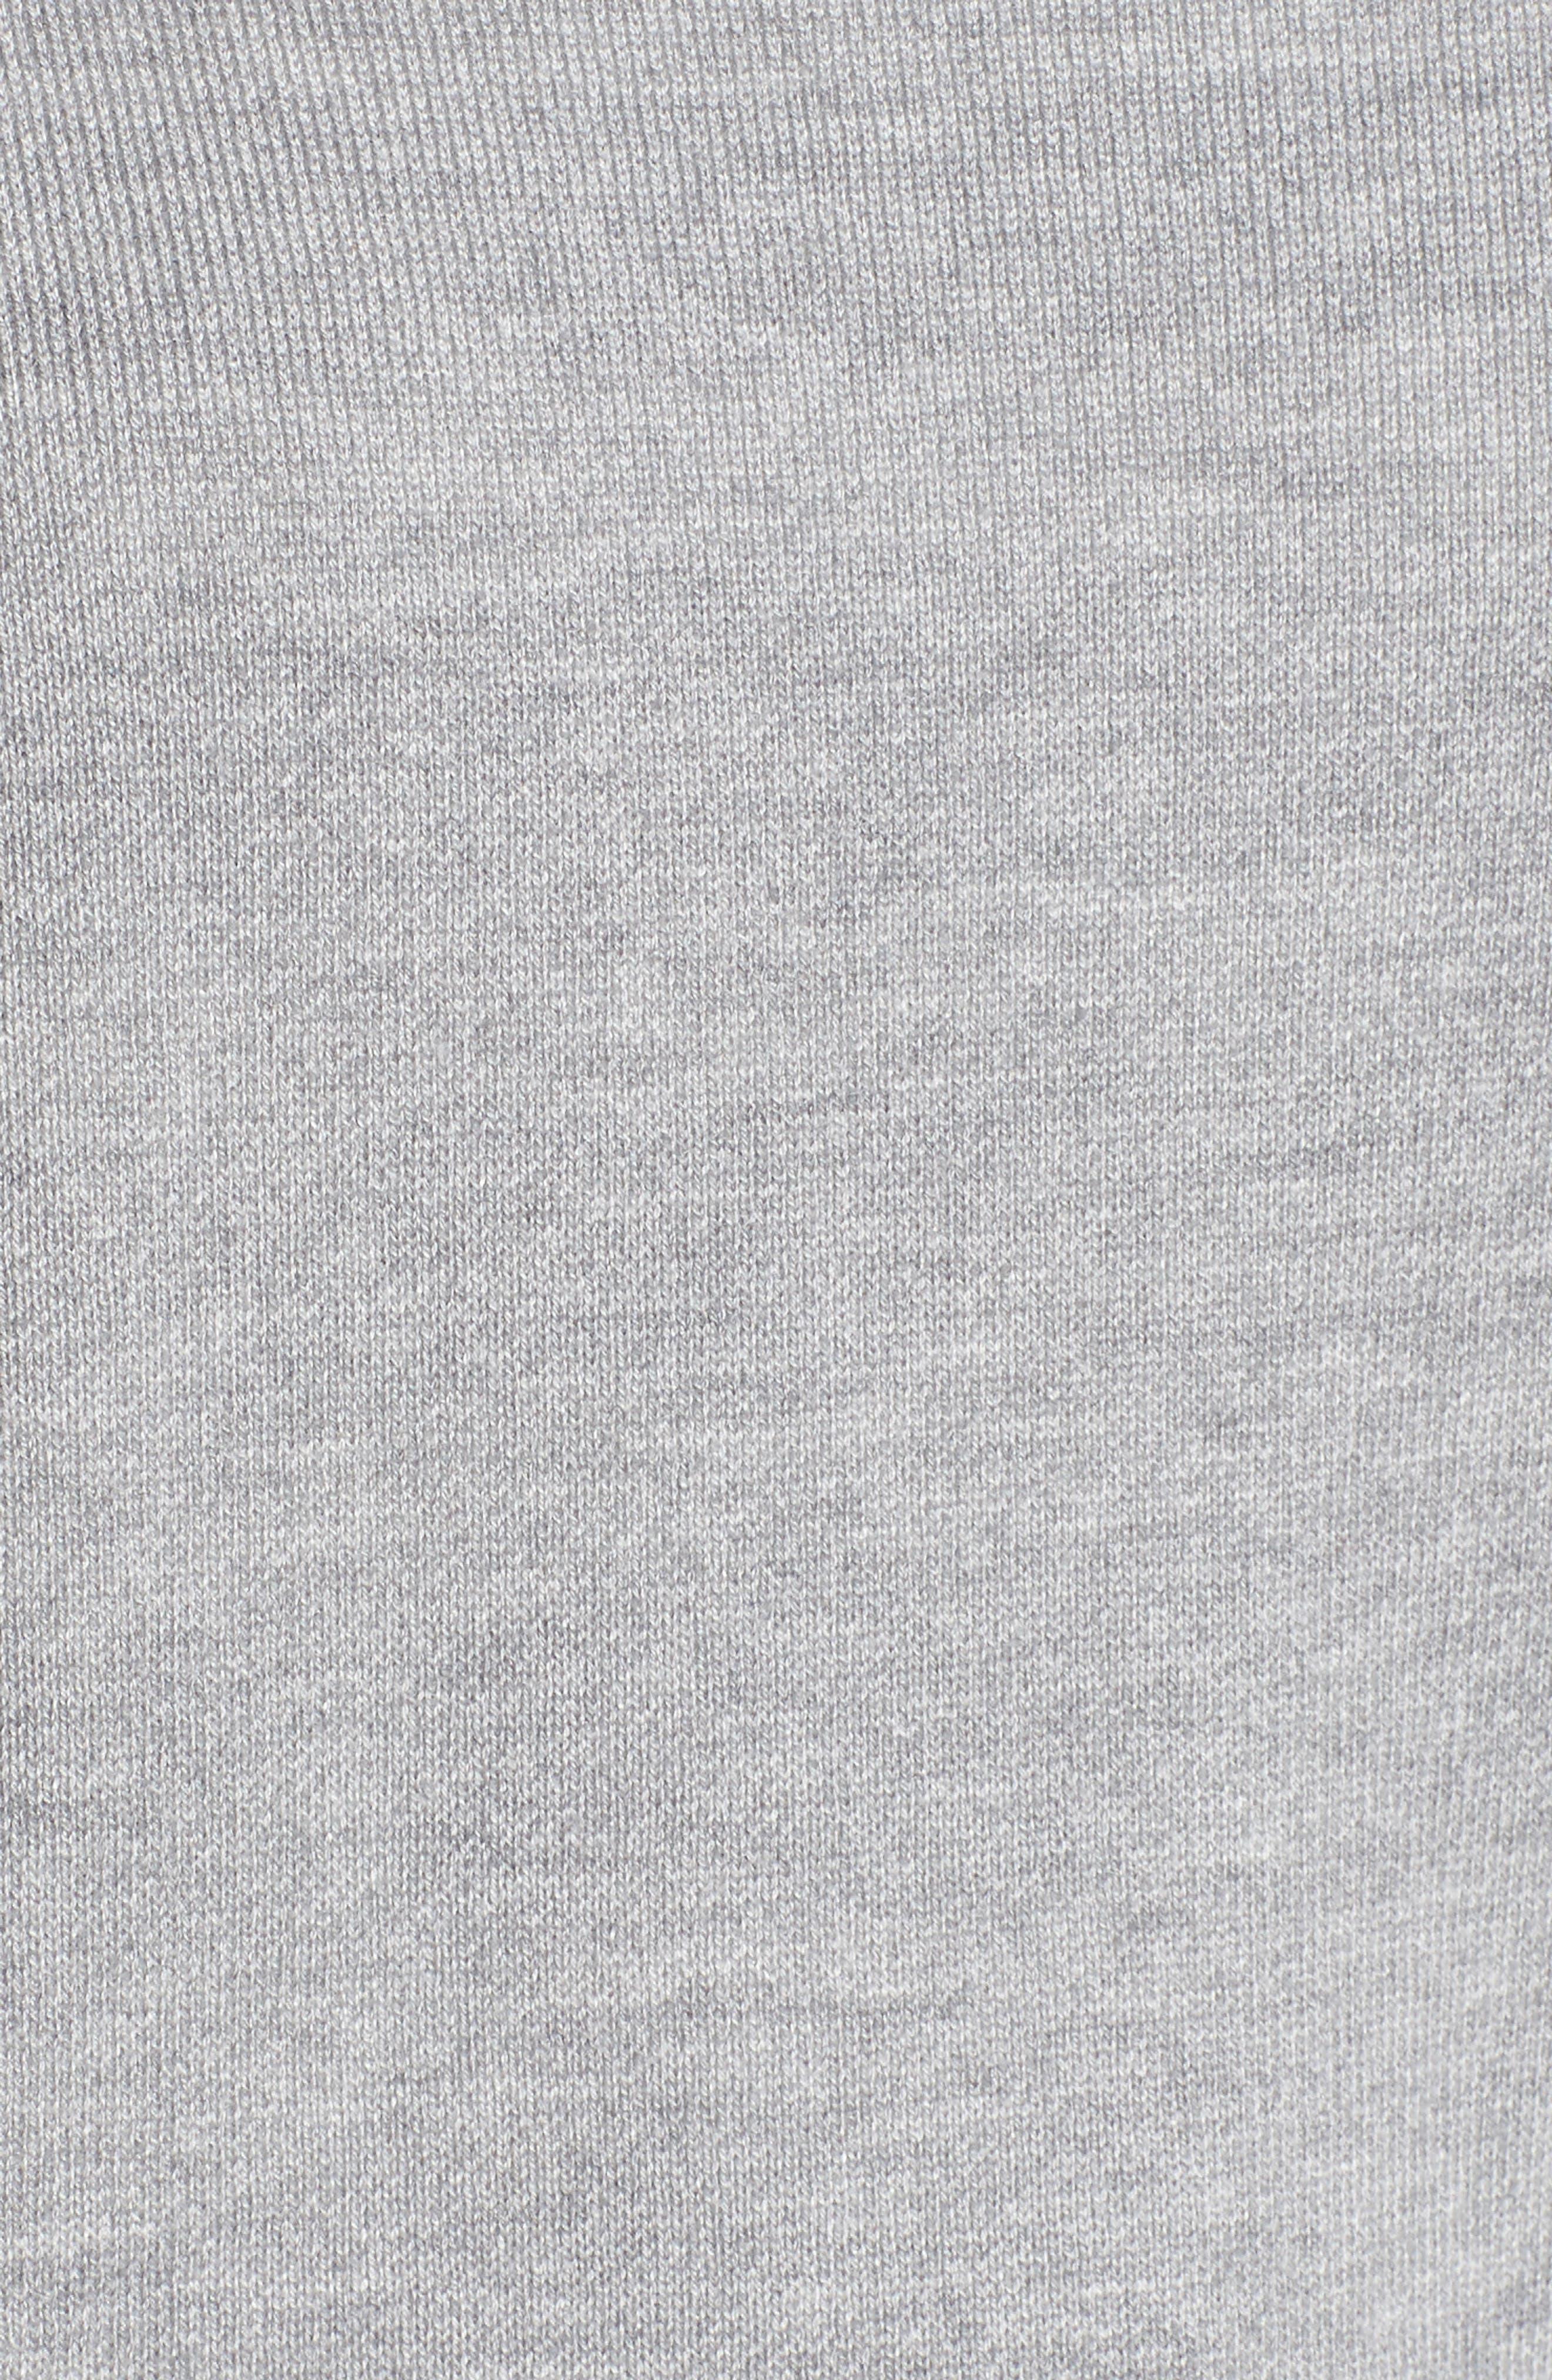 Devon Crossback Sweater,                             Alternate thumbnail 5, color,                             Light Heather Grey